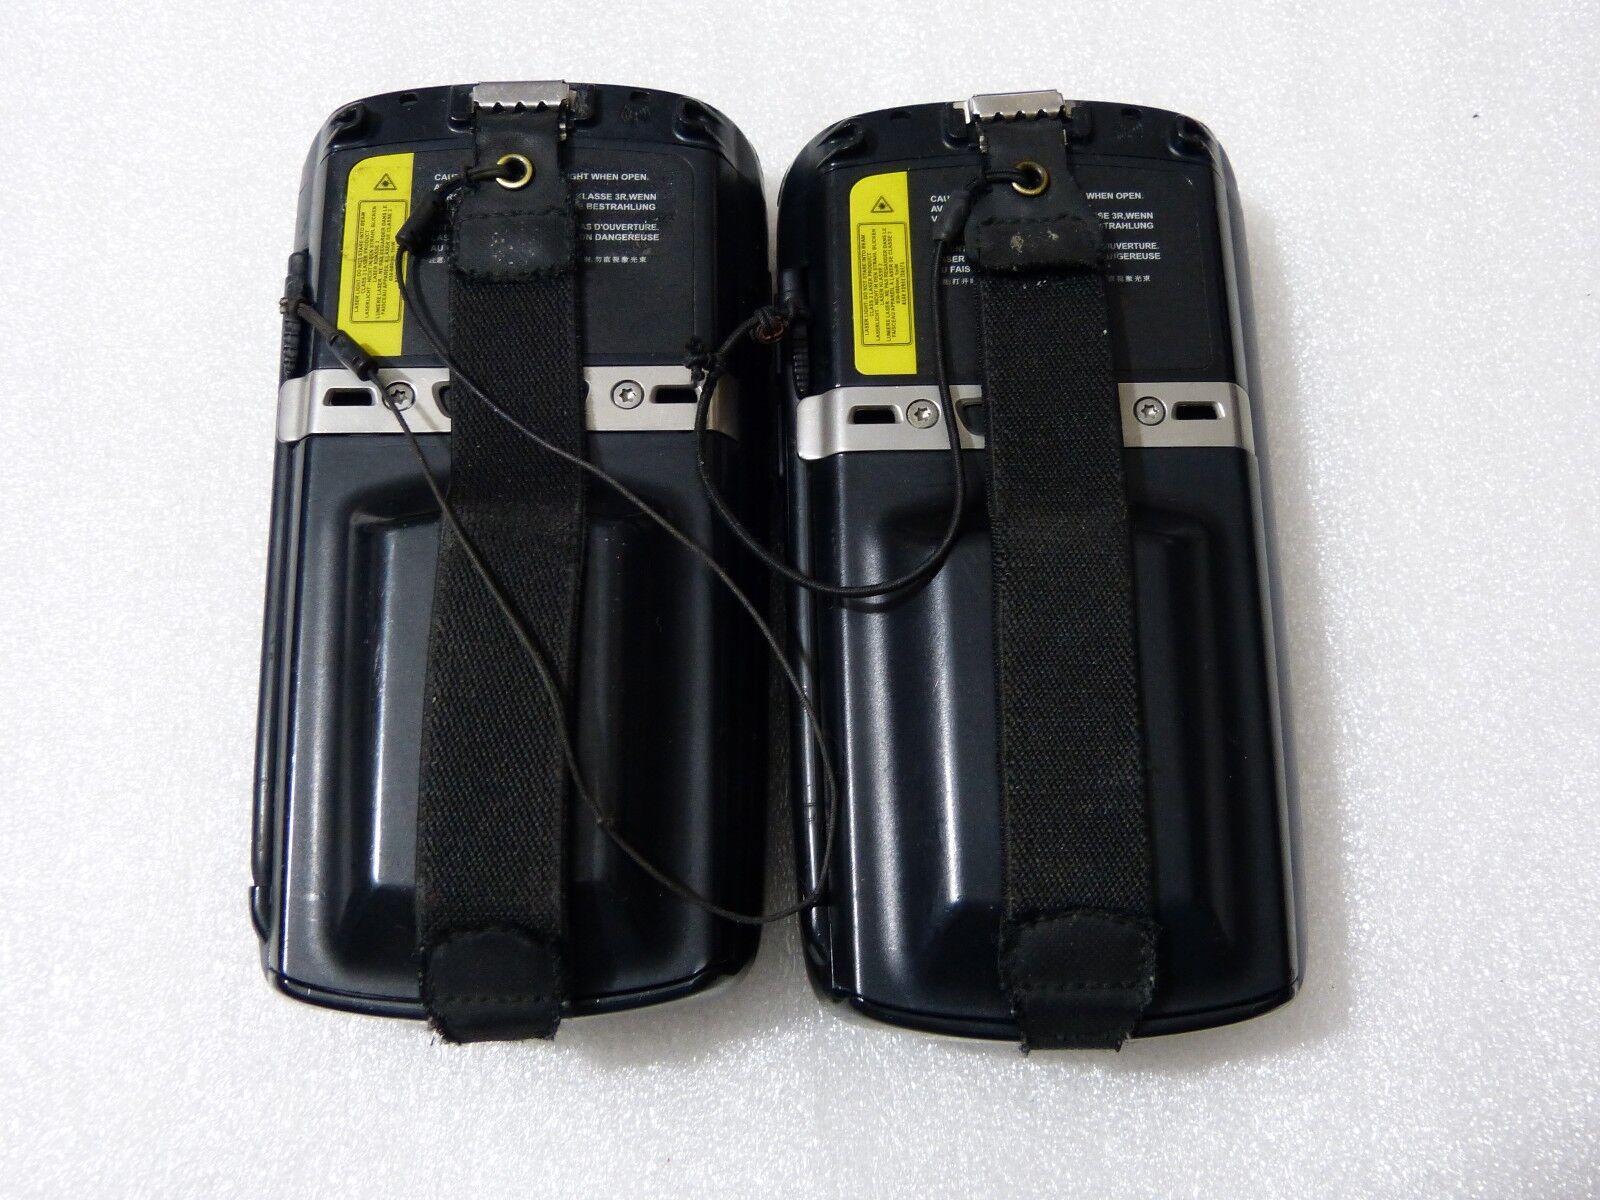 Motorola MC55 MC55A0-P 30 SWQQA 94R 1D ciclismo 2D PDA escáner de código de barras ciclismo 1D 6.5 (Ref6) 61619c